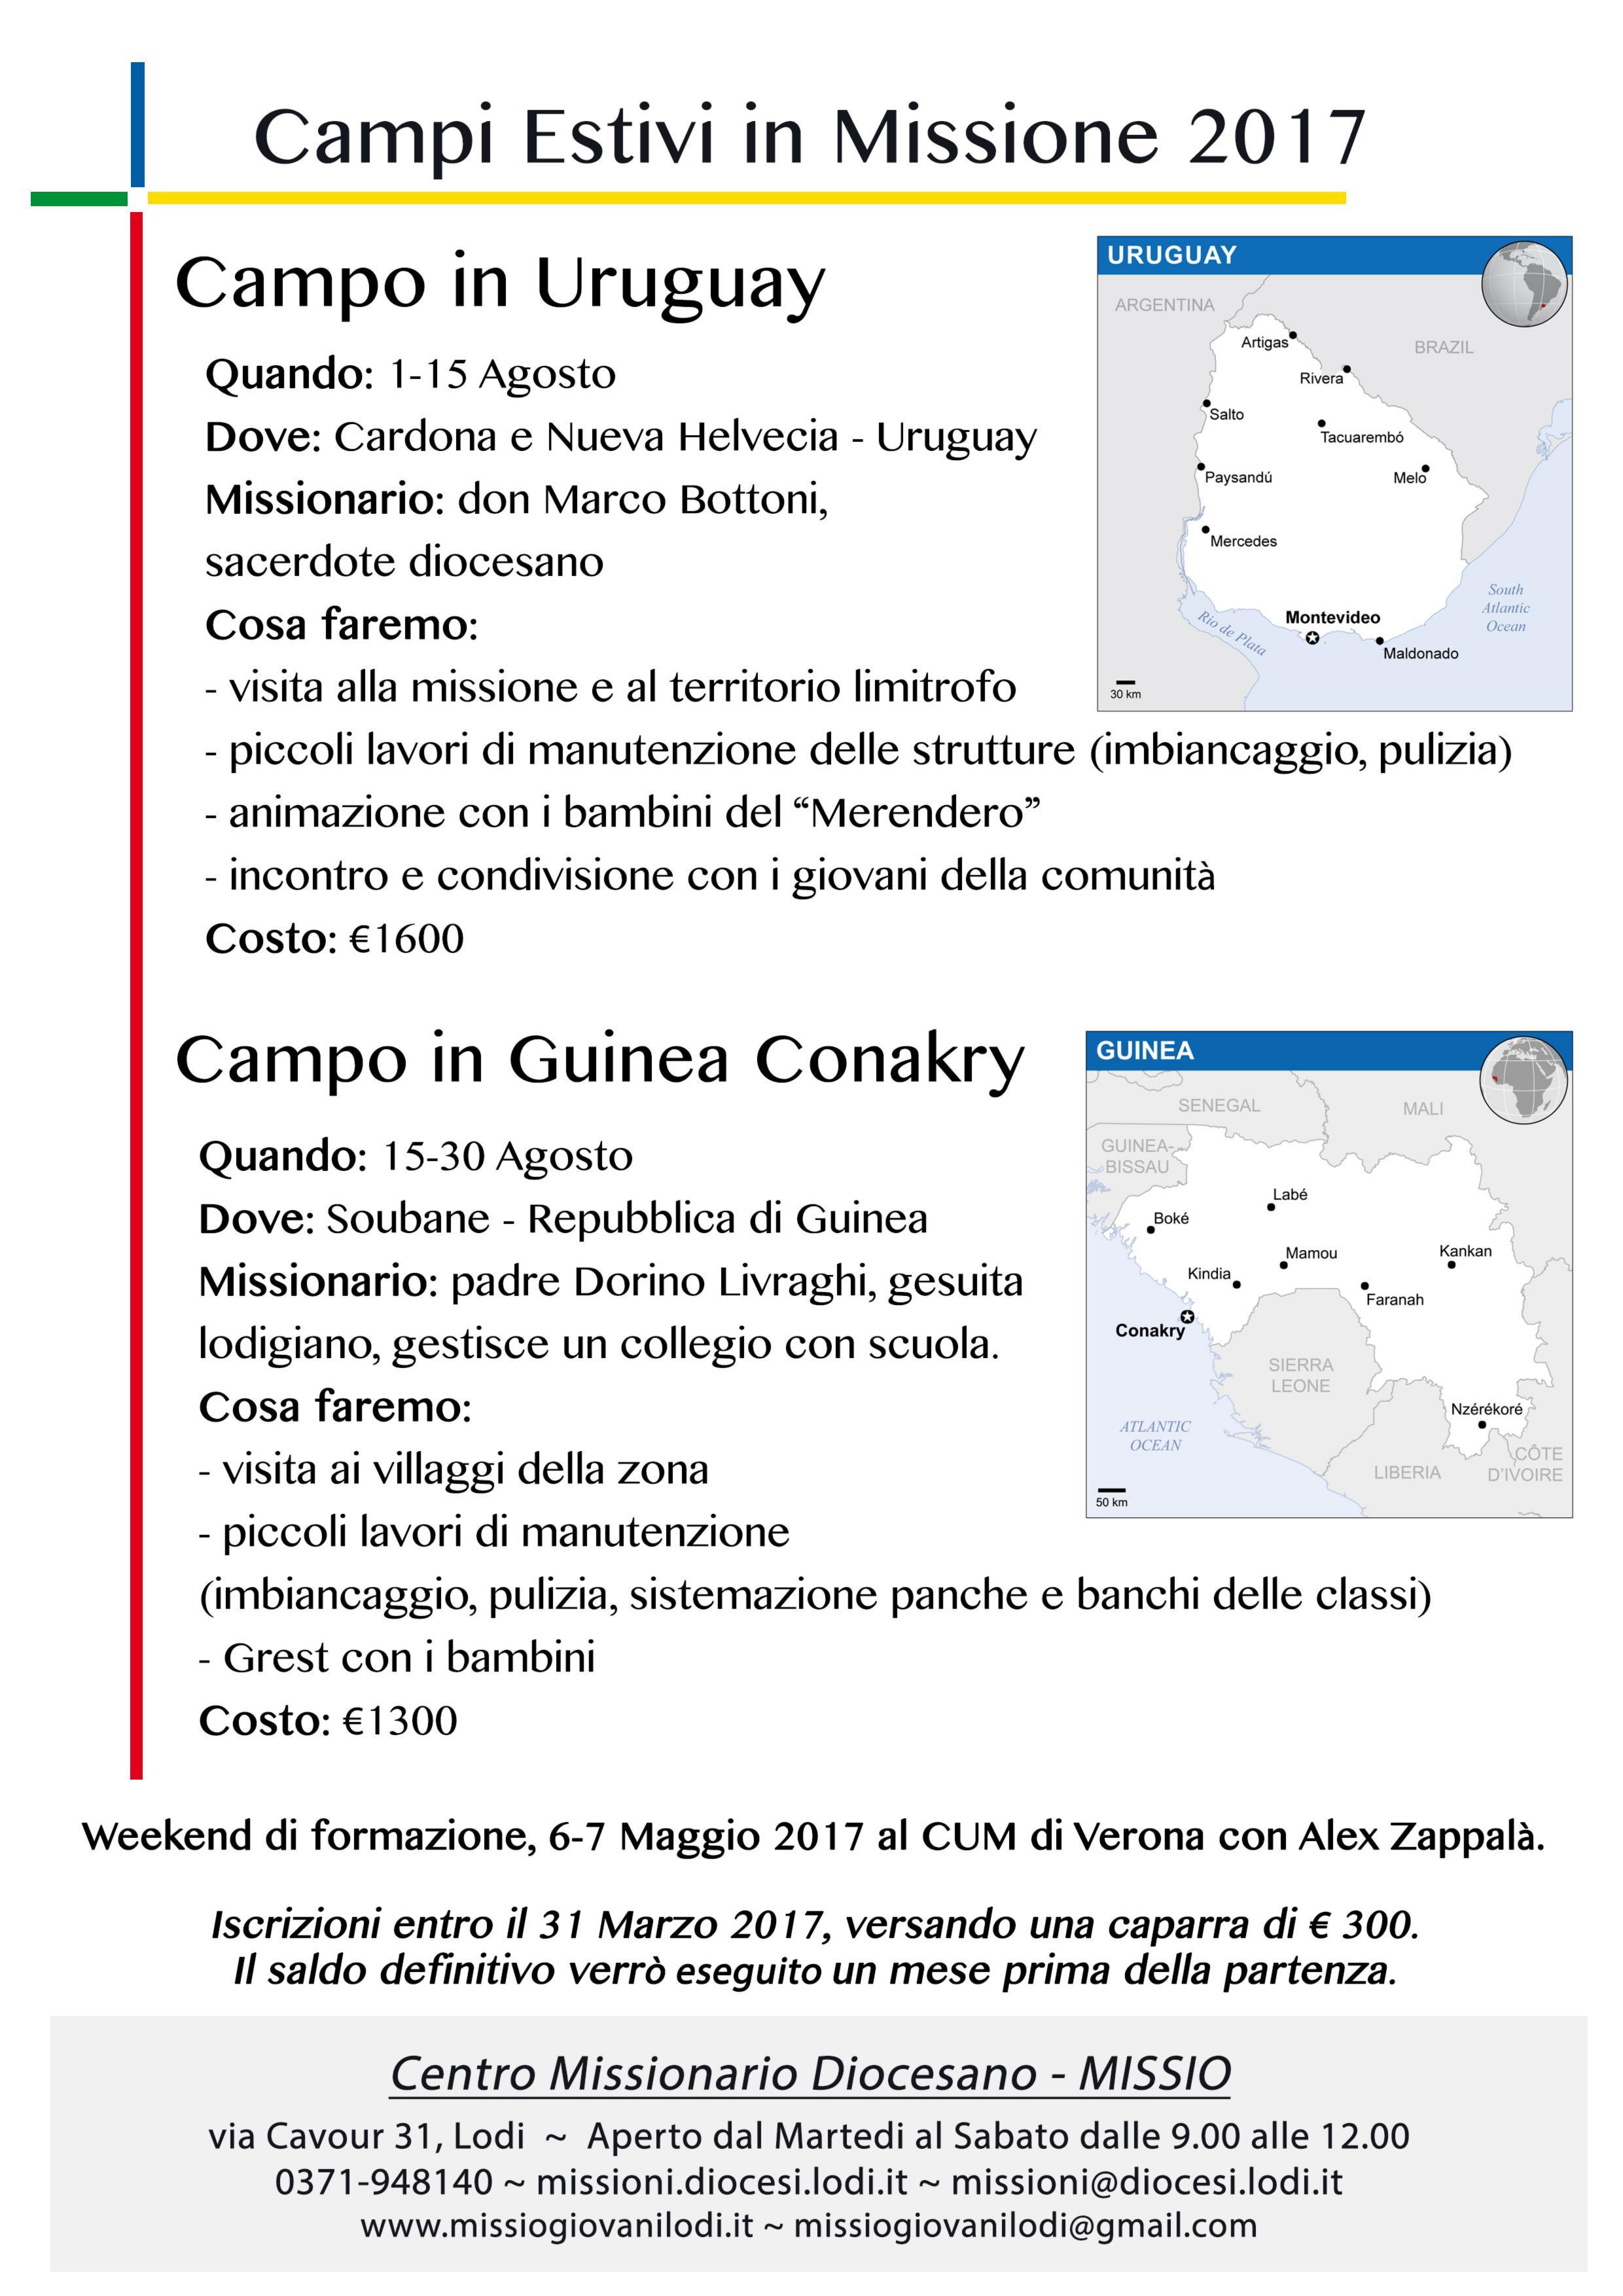 2017DescrizioneCampiUruguay-GuineaConakry